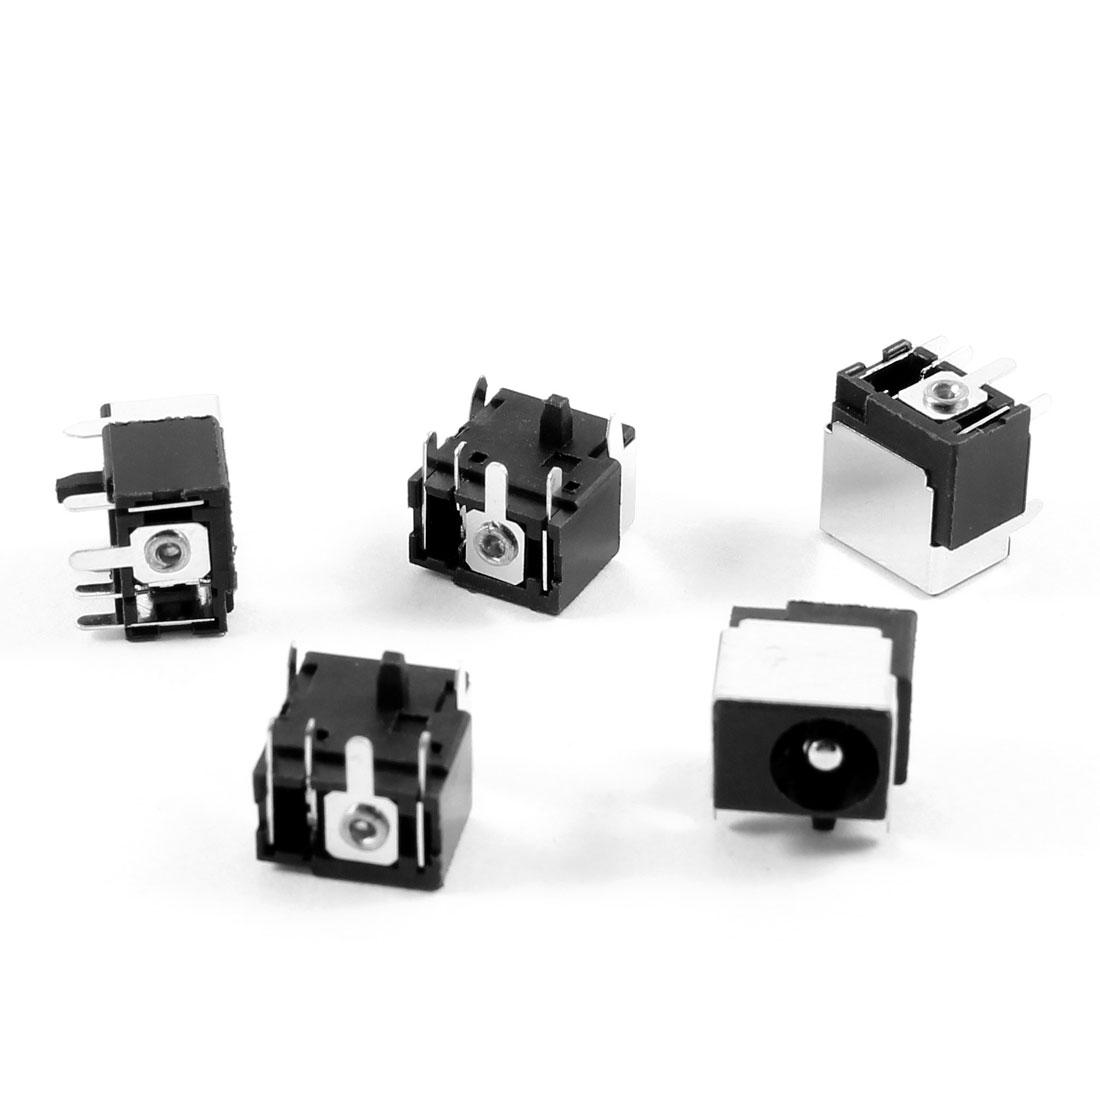 5 Pcs PJ016 DC Power Jack for Acer Travelmate 2700 3200 4400 4402WLMI 4500